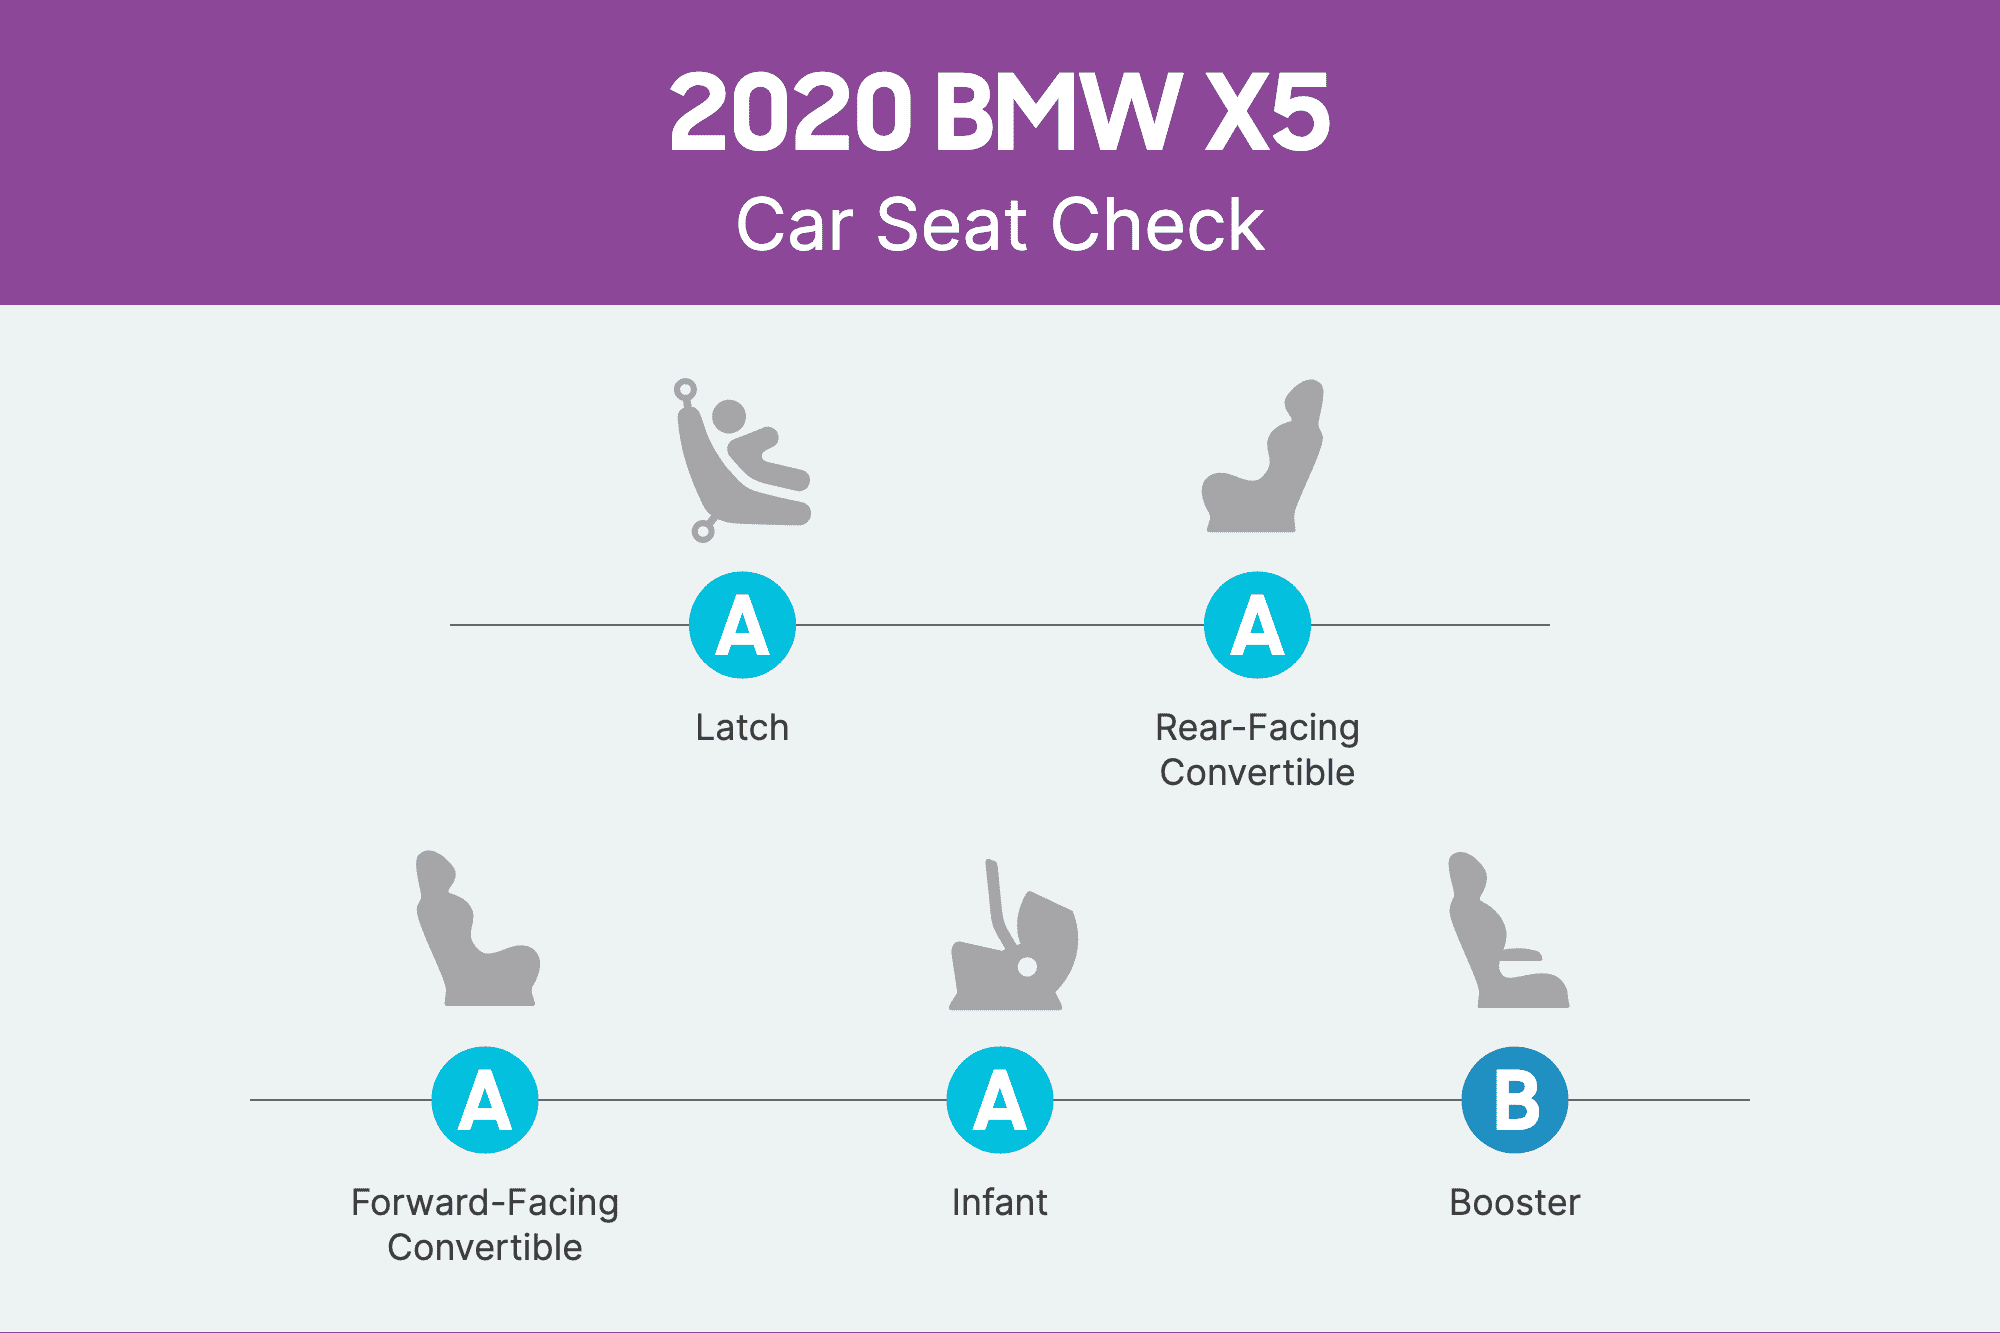 bmw-x5-2020-csc-scorecard.png